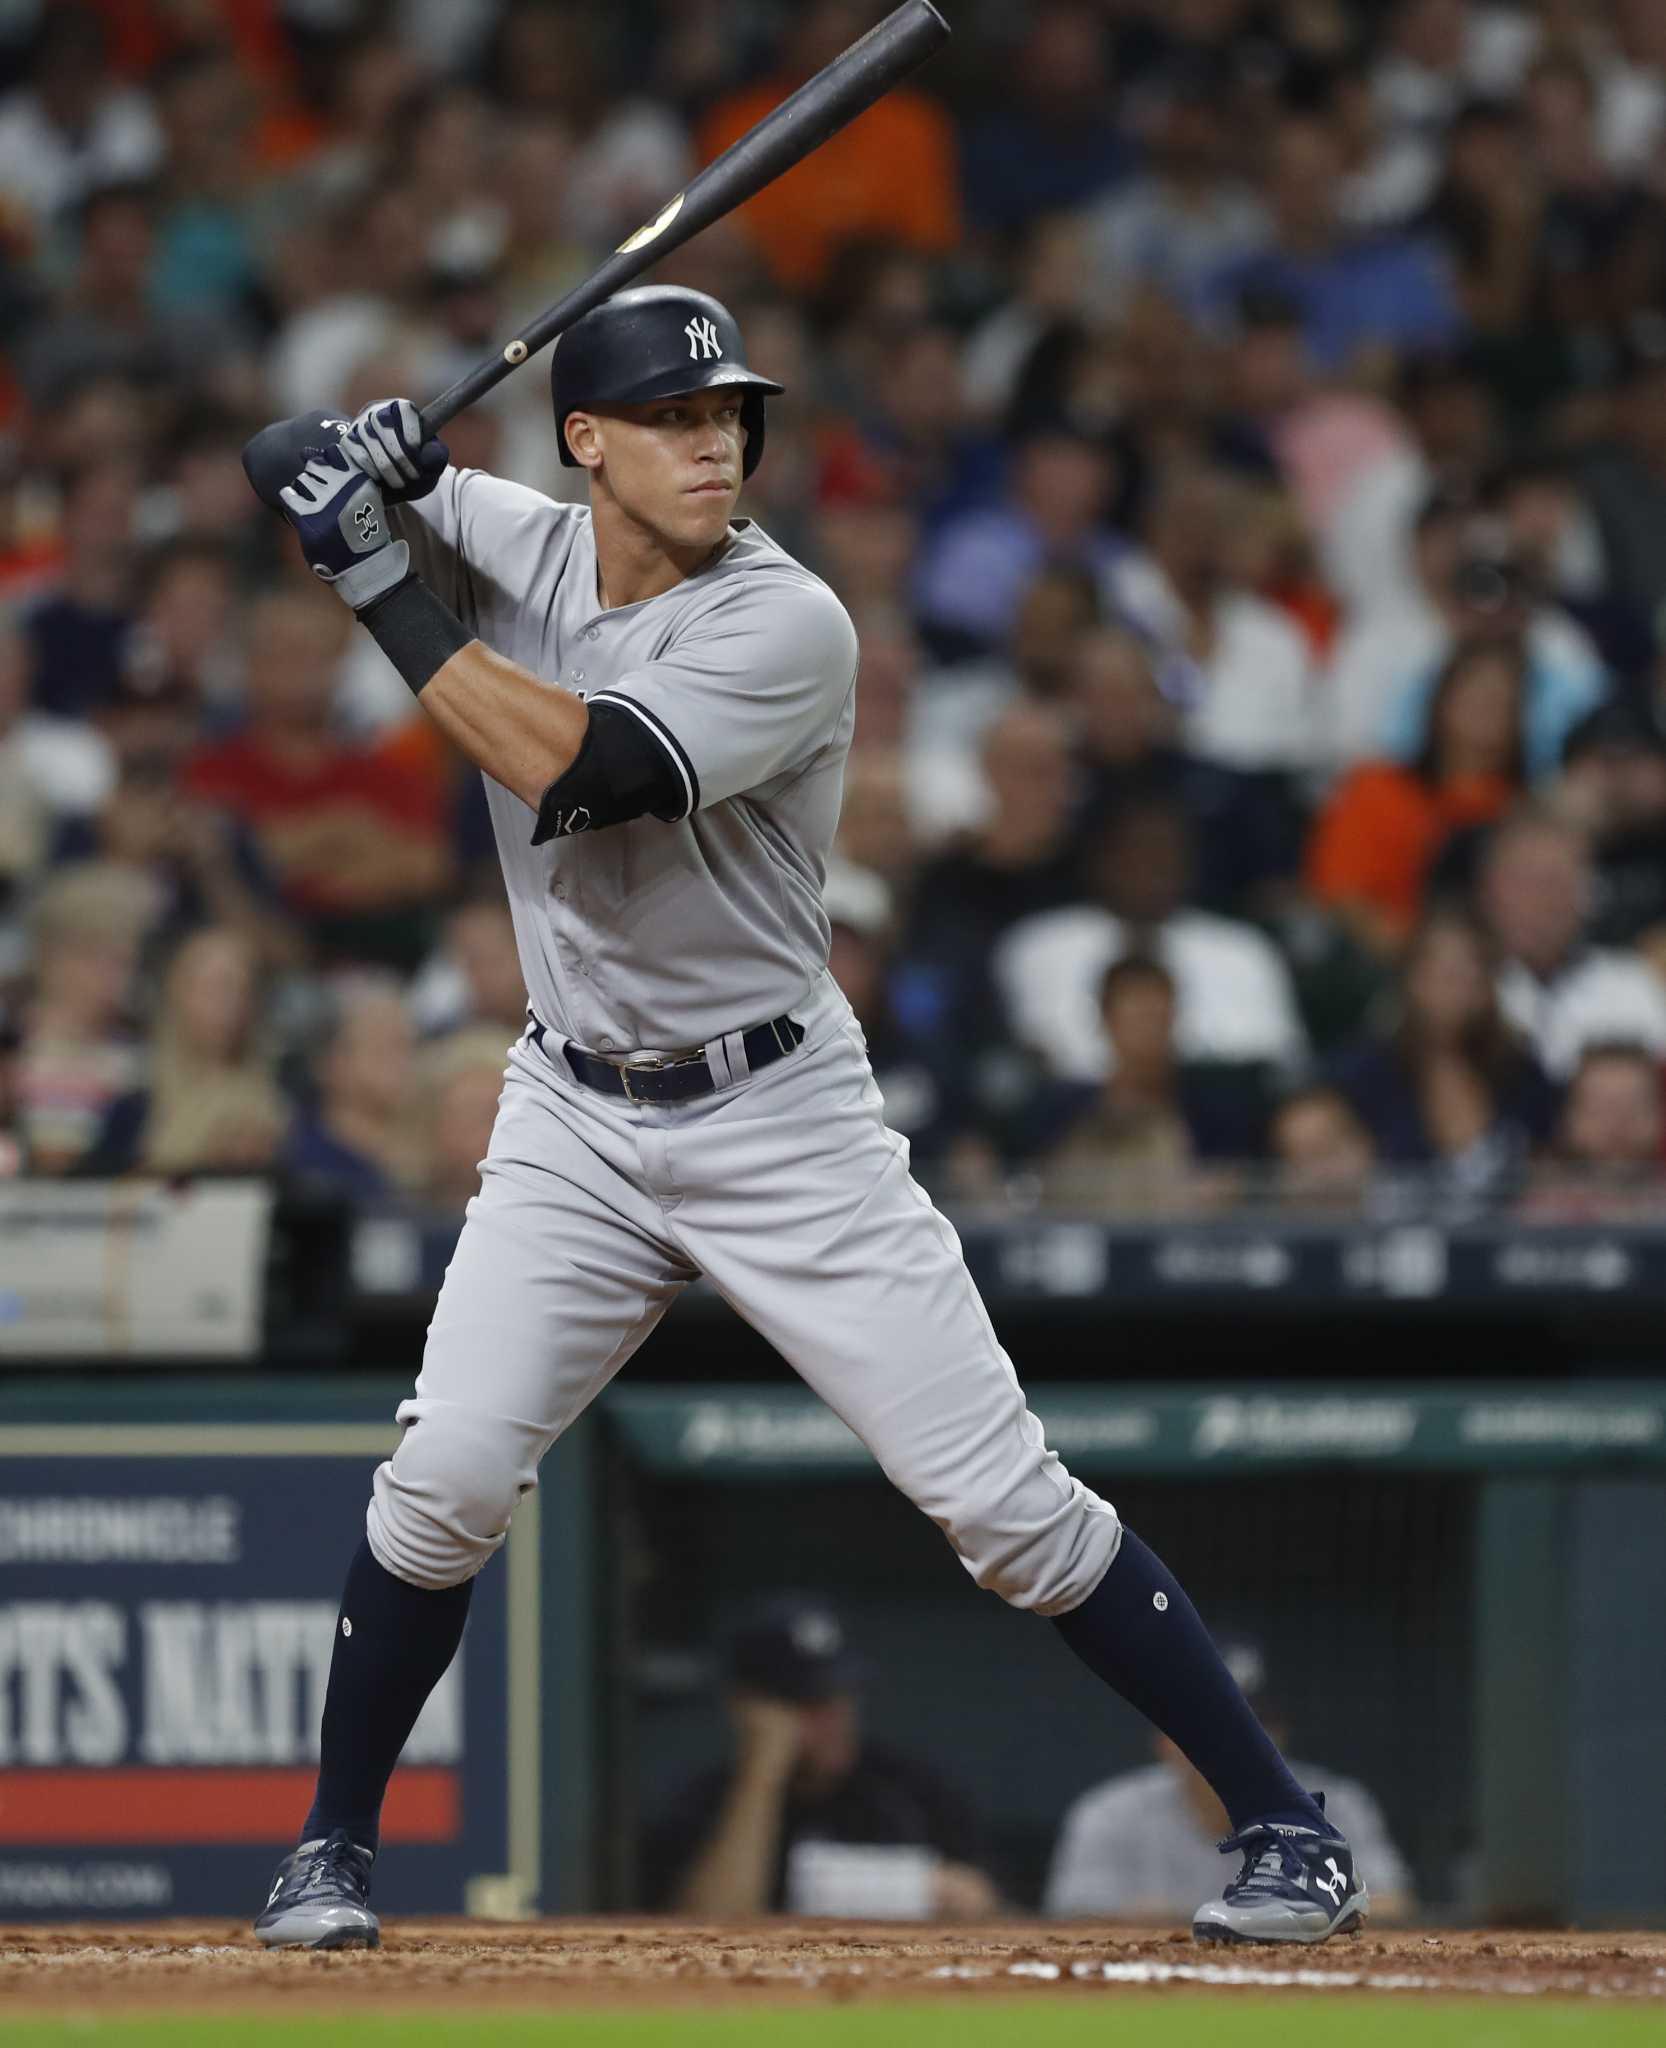 Yankees Rookie Outfielder Aaron Judge Has Superstar's